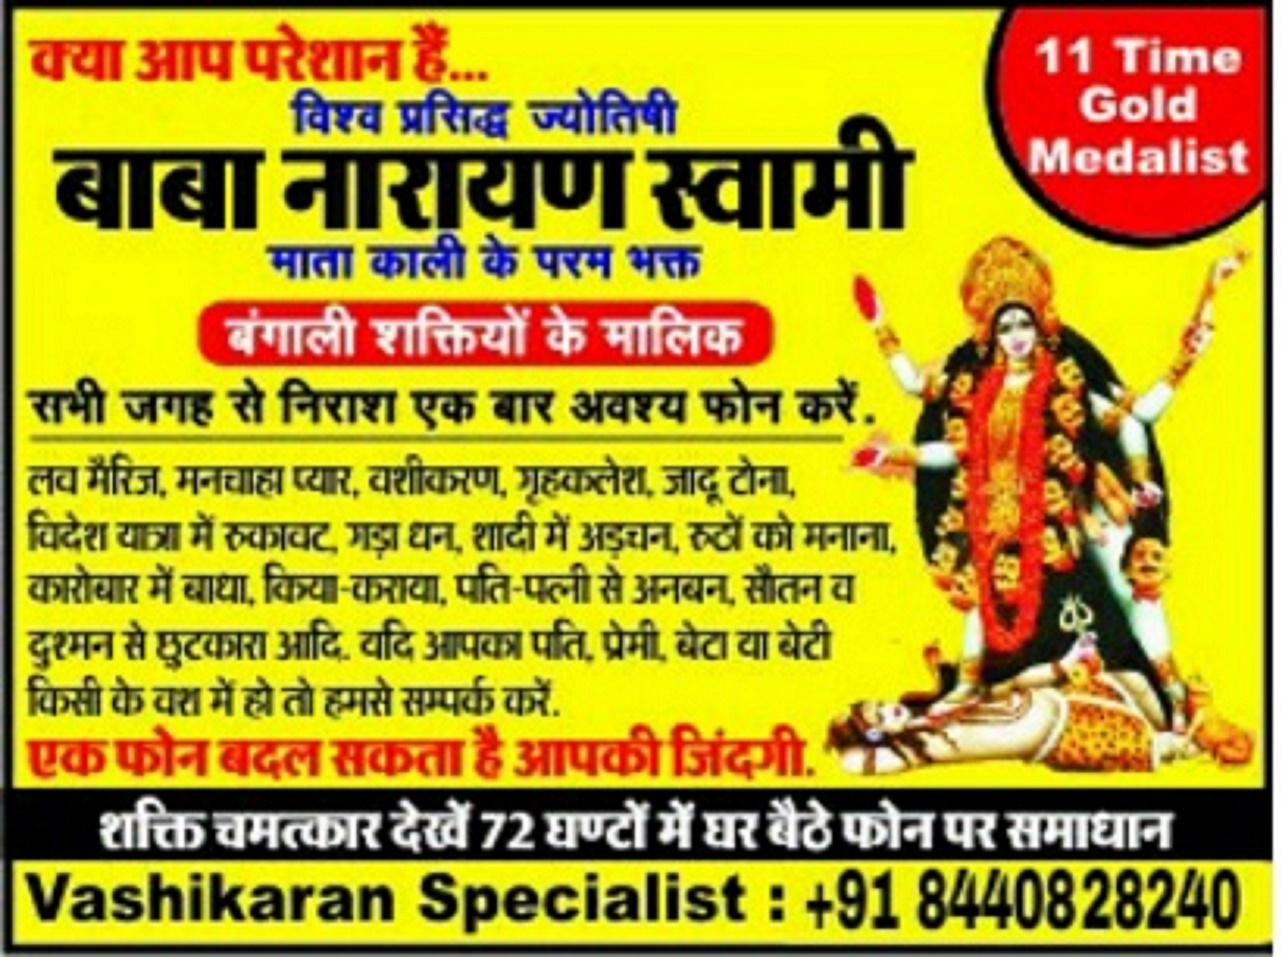 Black Magic Specialist baba ji 08440828240 madhya pradesh indore